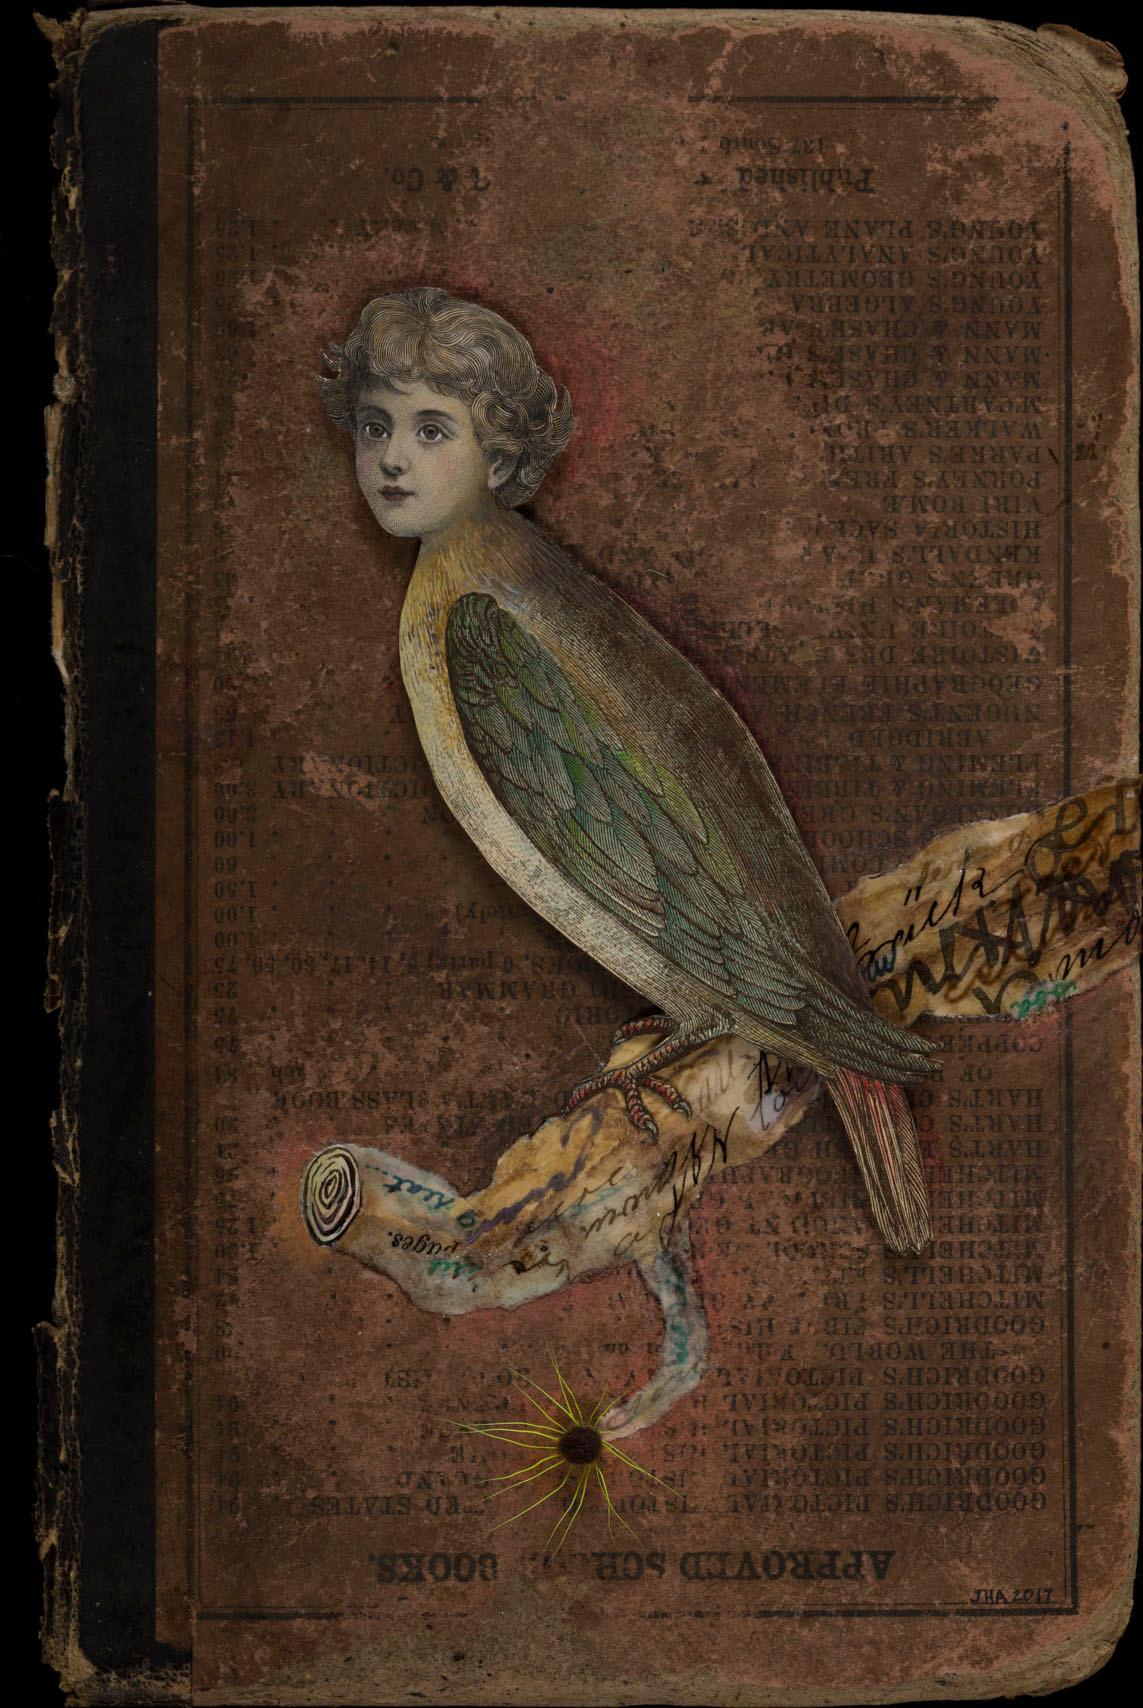 Book Cover No. 188